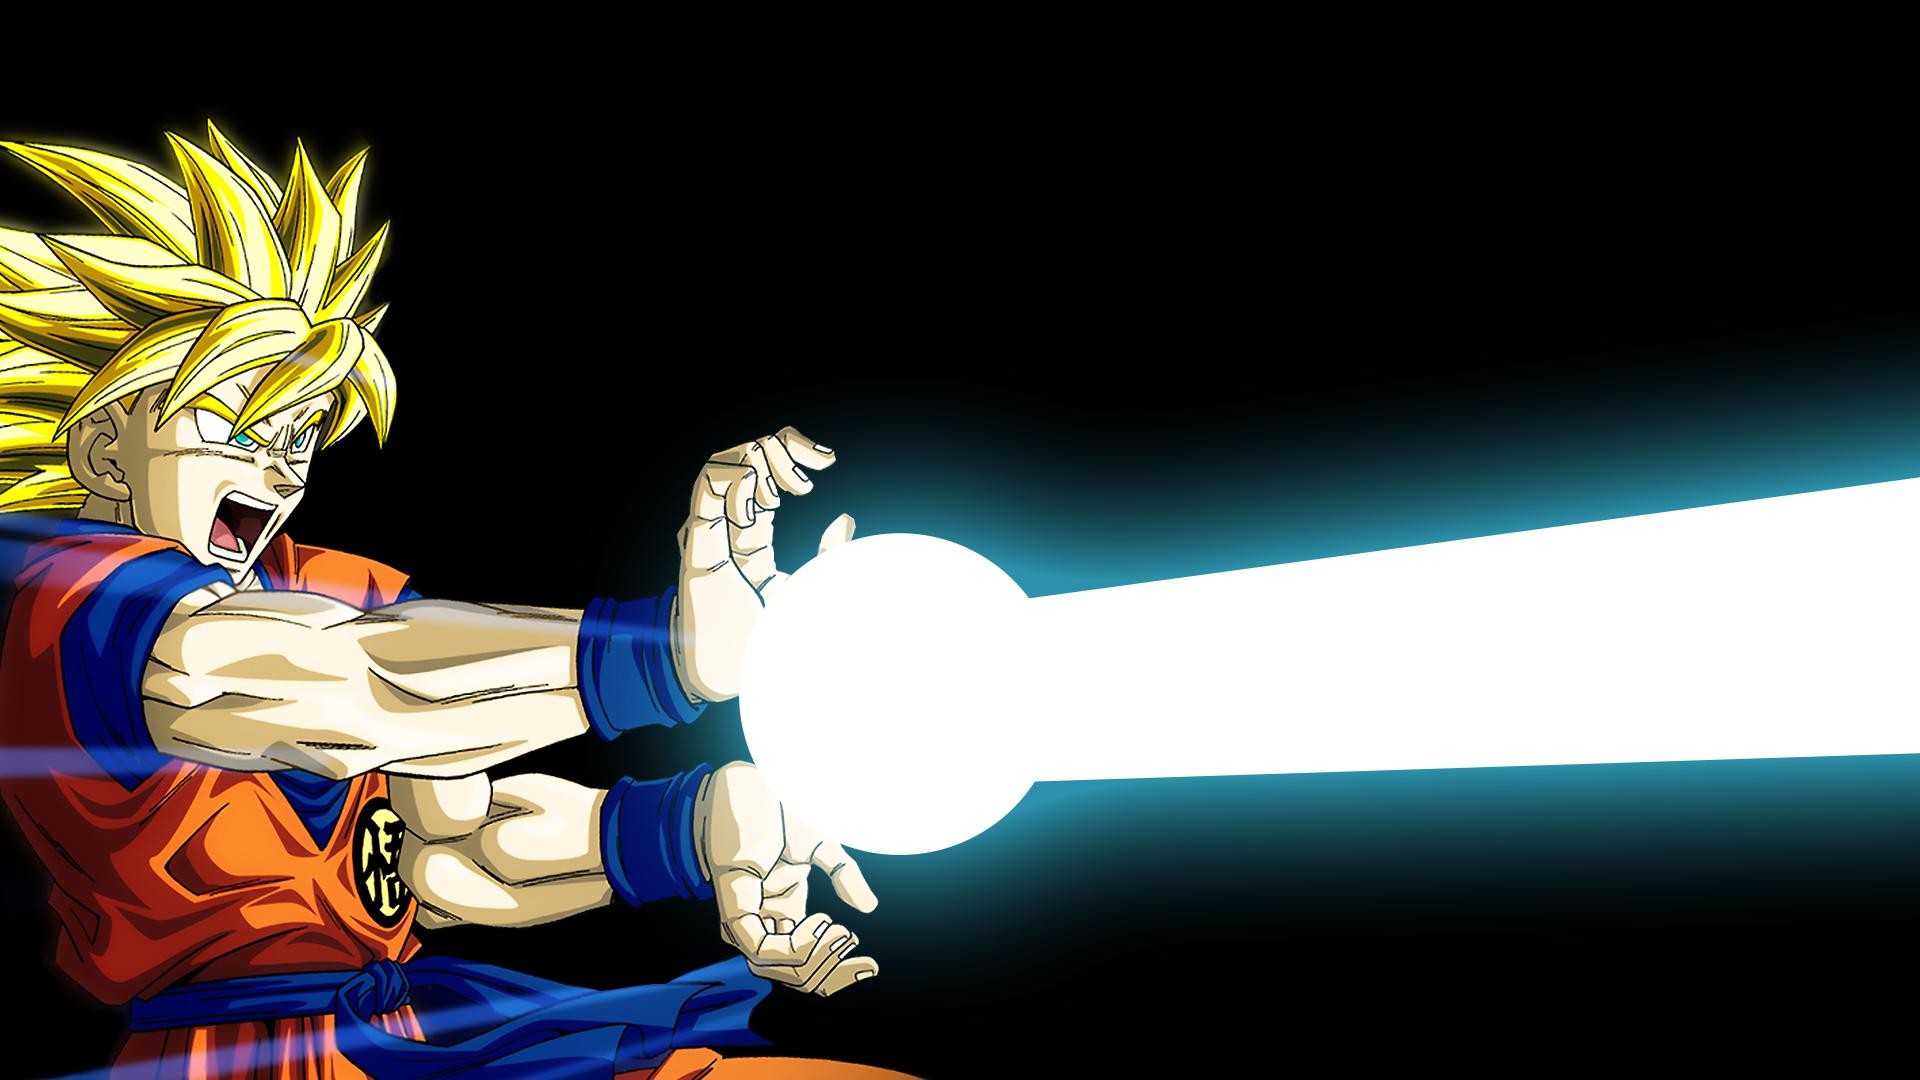 Goku Ultra Instinct Kamehameha Wallpaper Hd